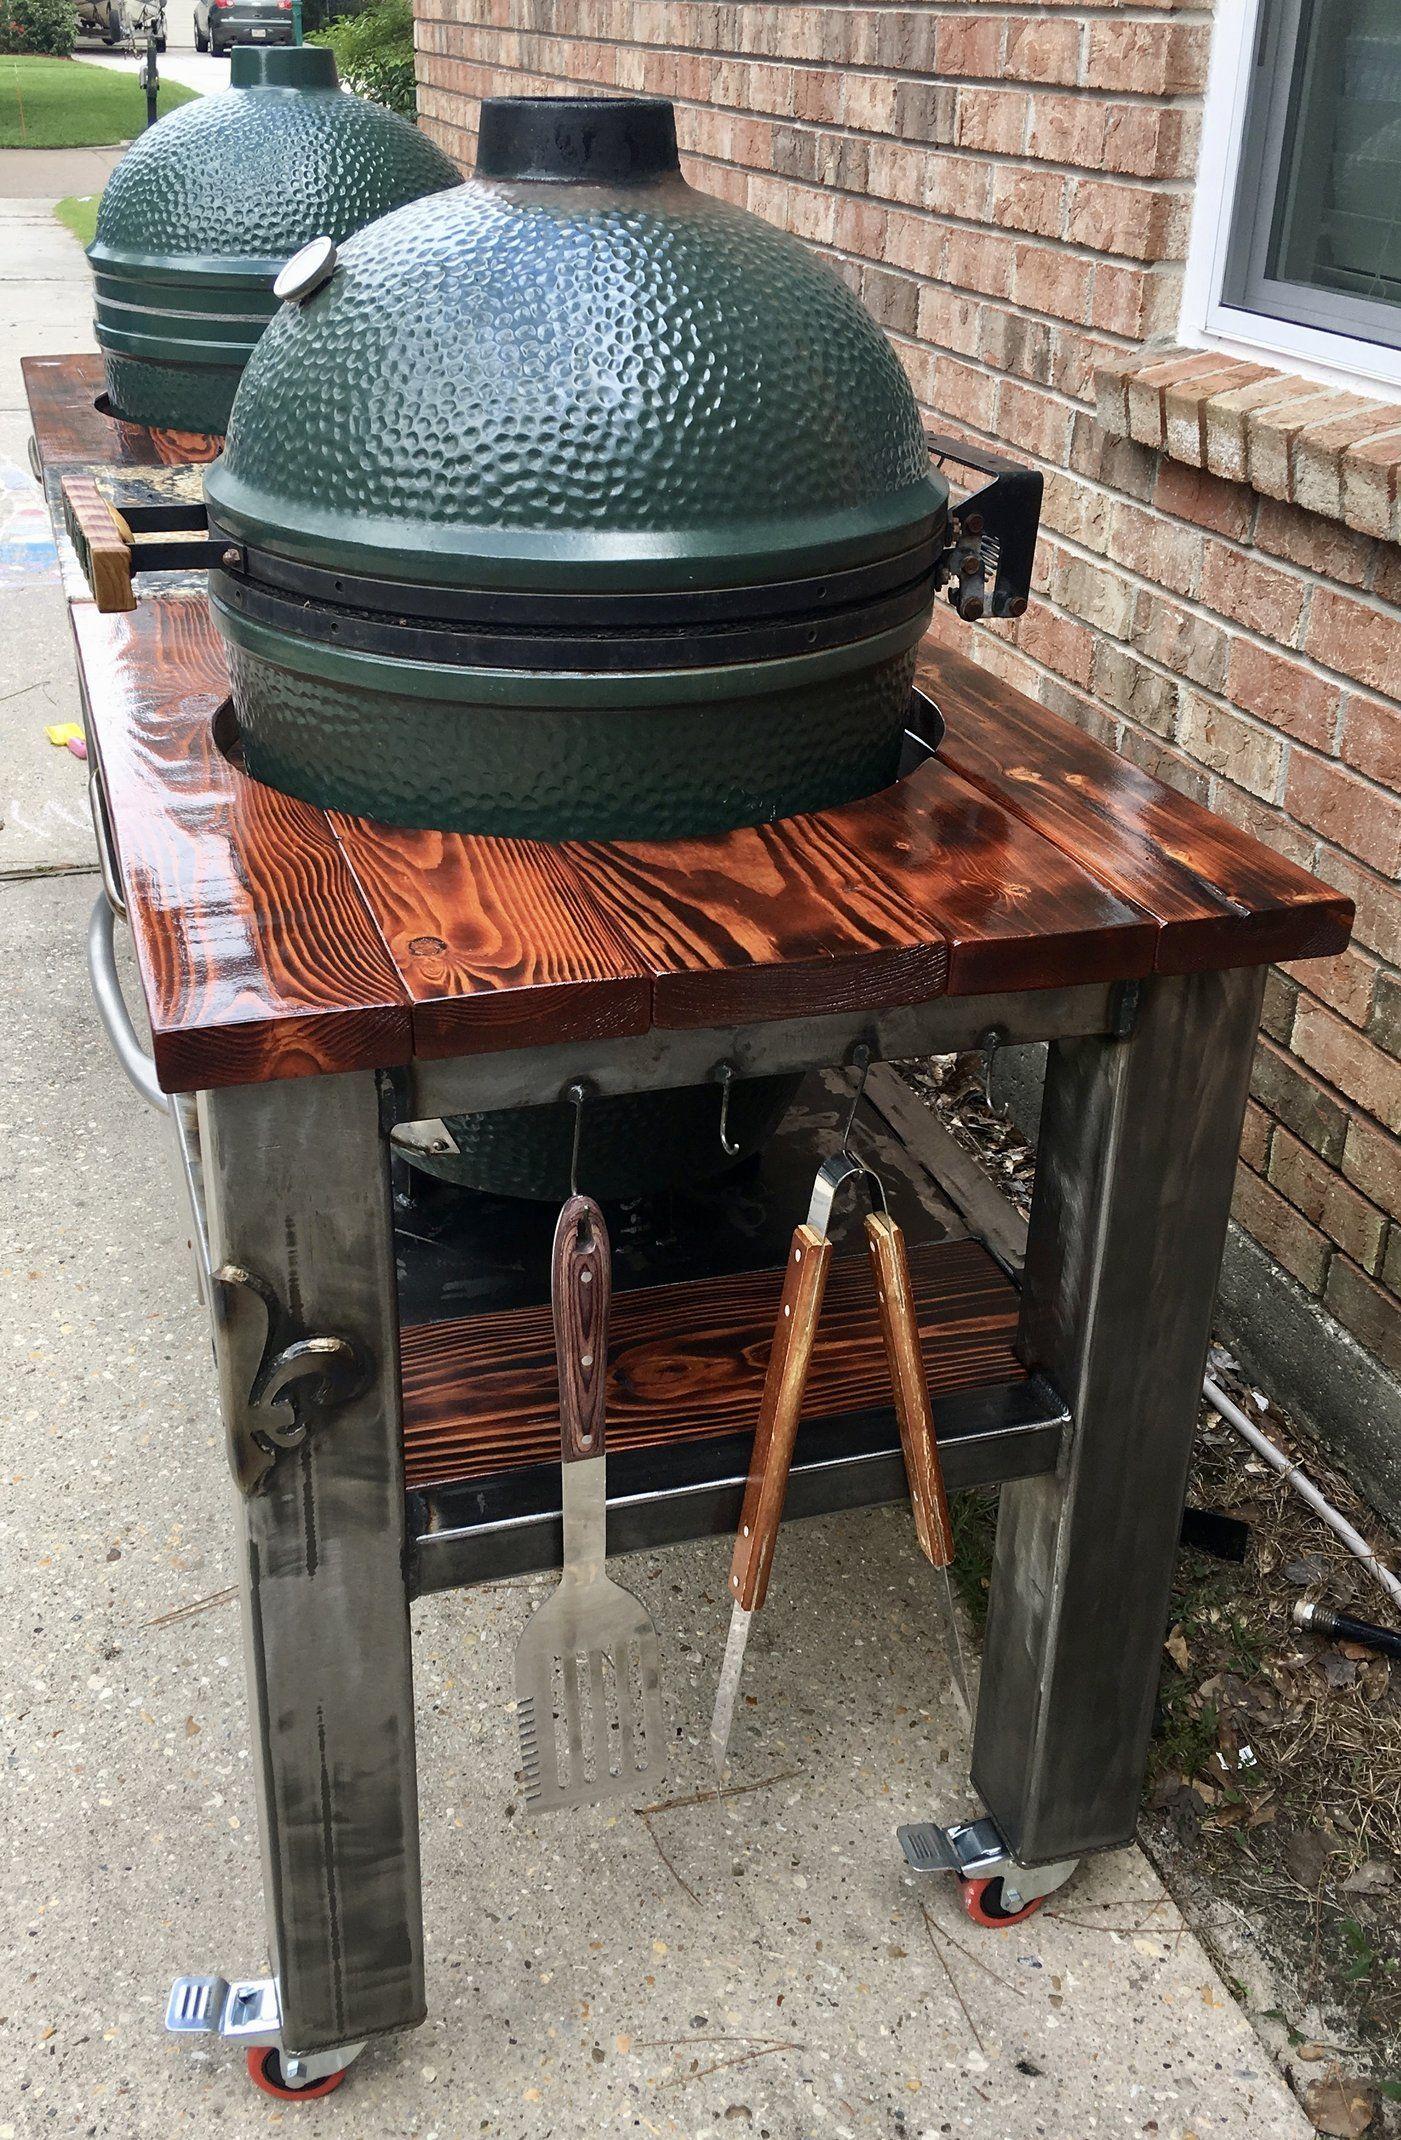 Image Https Us V Cdn Net 5017260 Uploads Editor X1 Pqk0igc8diyu Jpeg In 2020 Big Green Egg Table Big Green Egg Outdoor Kitchen Bbq Table